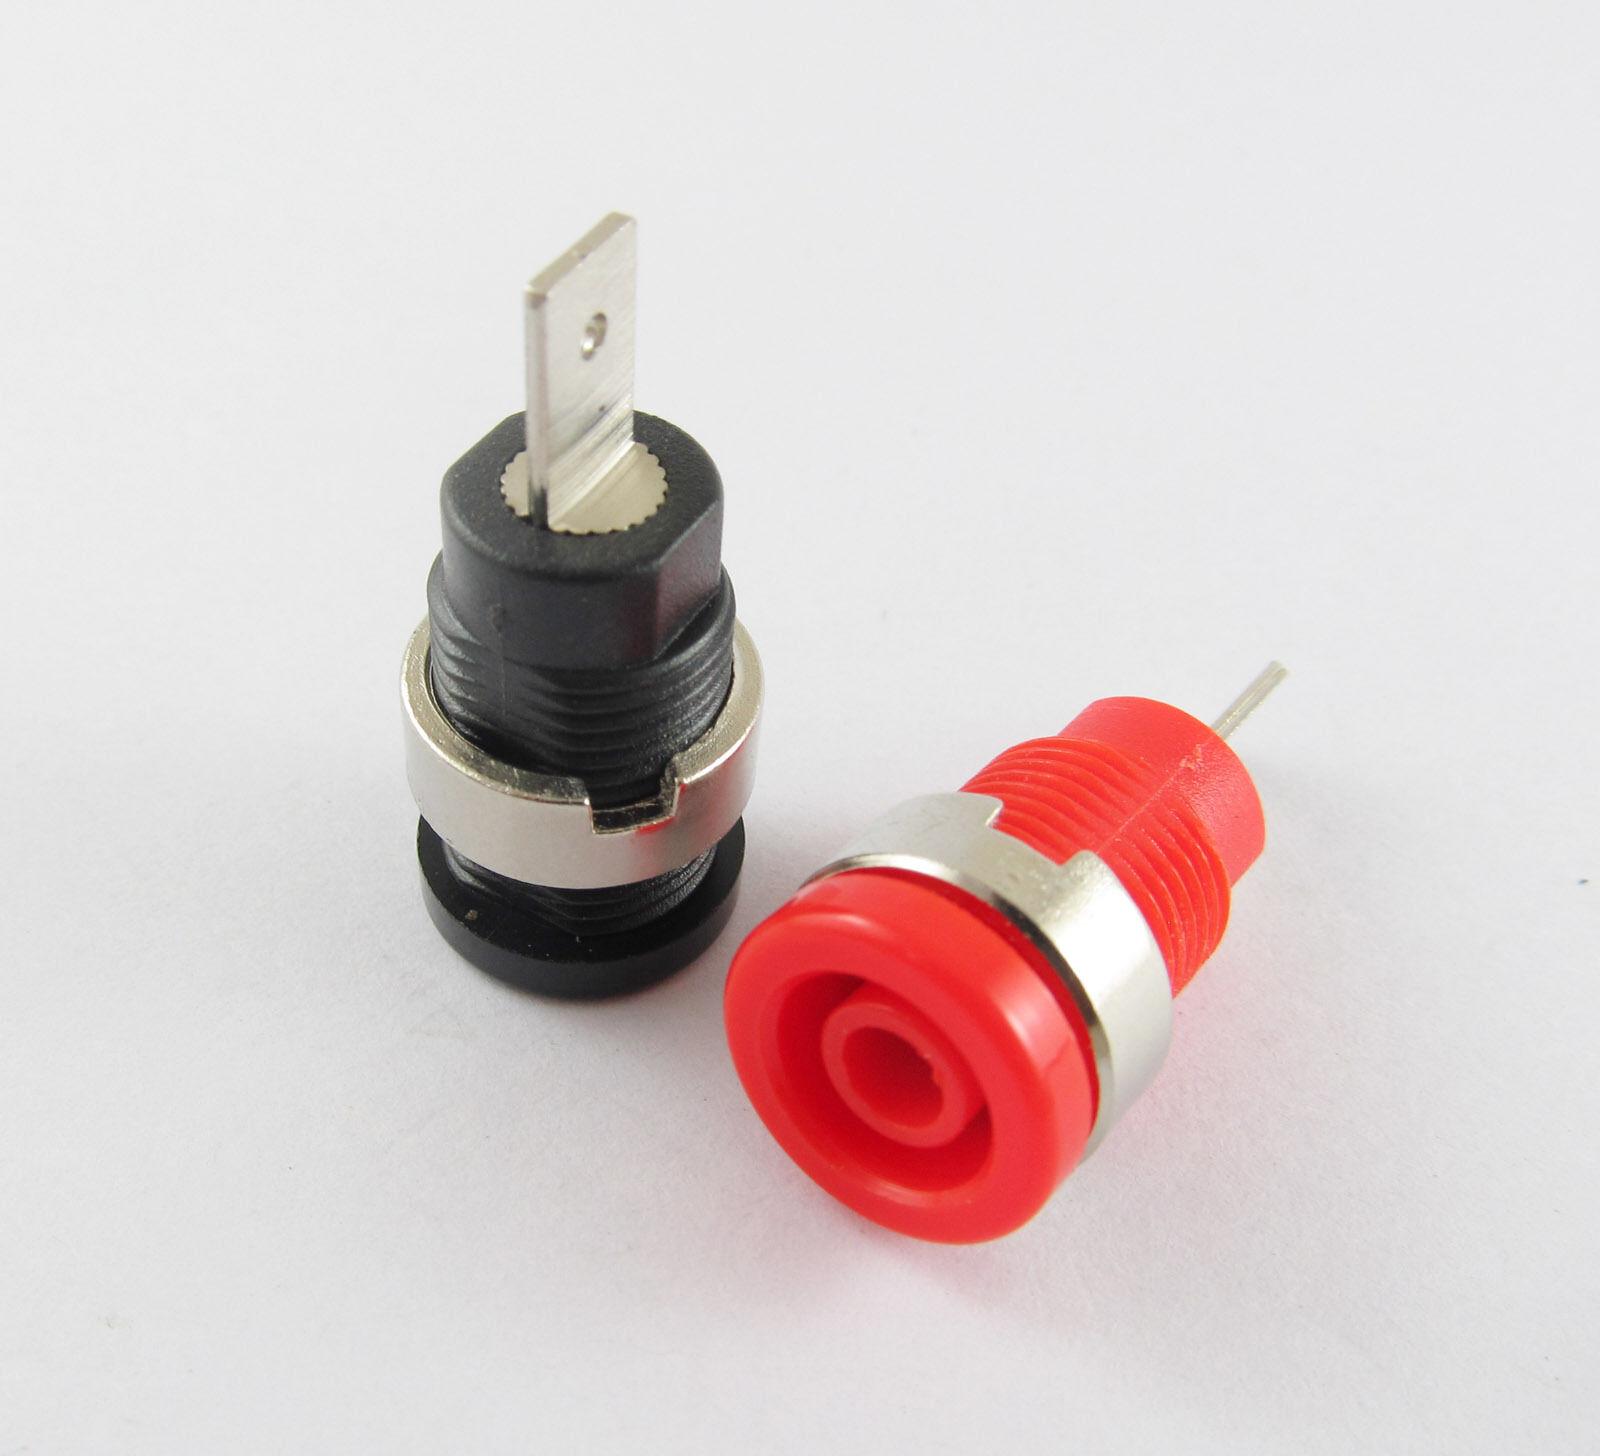 4pcs Amplifier Terminal Binding Post Banana Plug Jack Panel Mount Connector R/&B